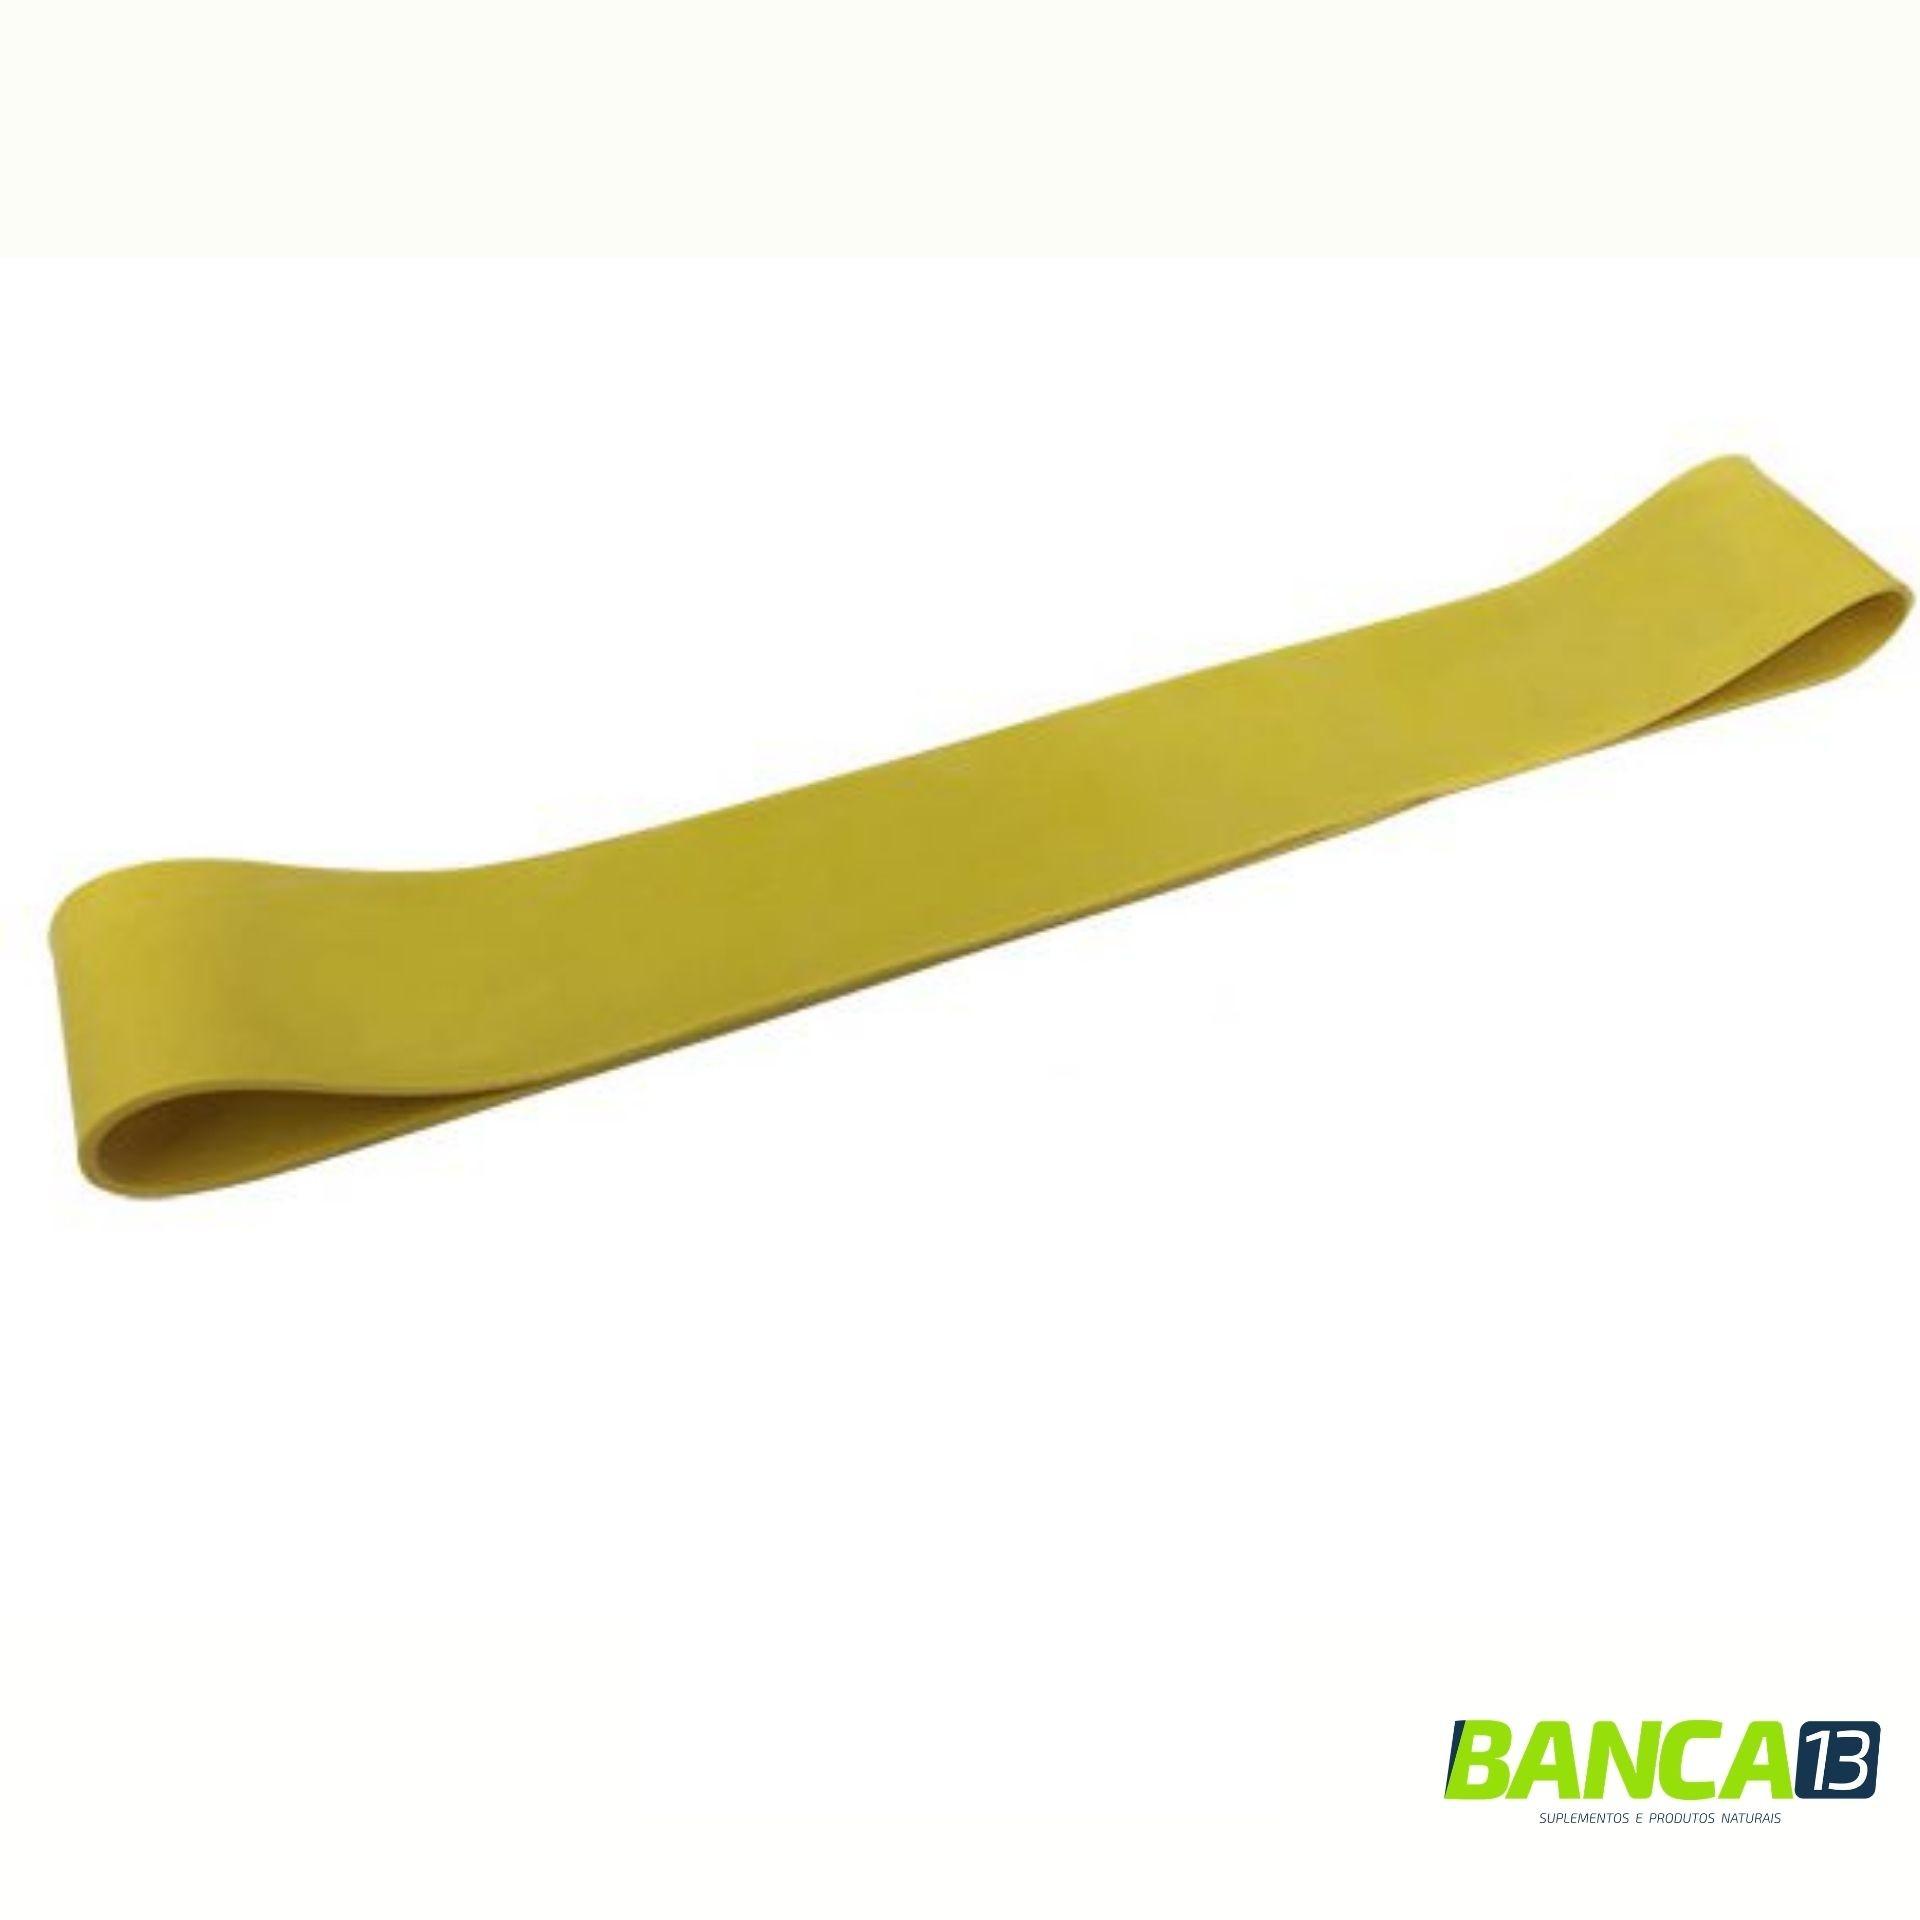 Rubber Band faixa cicular tensão leve - Prottector